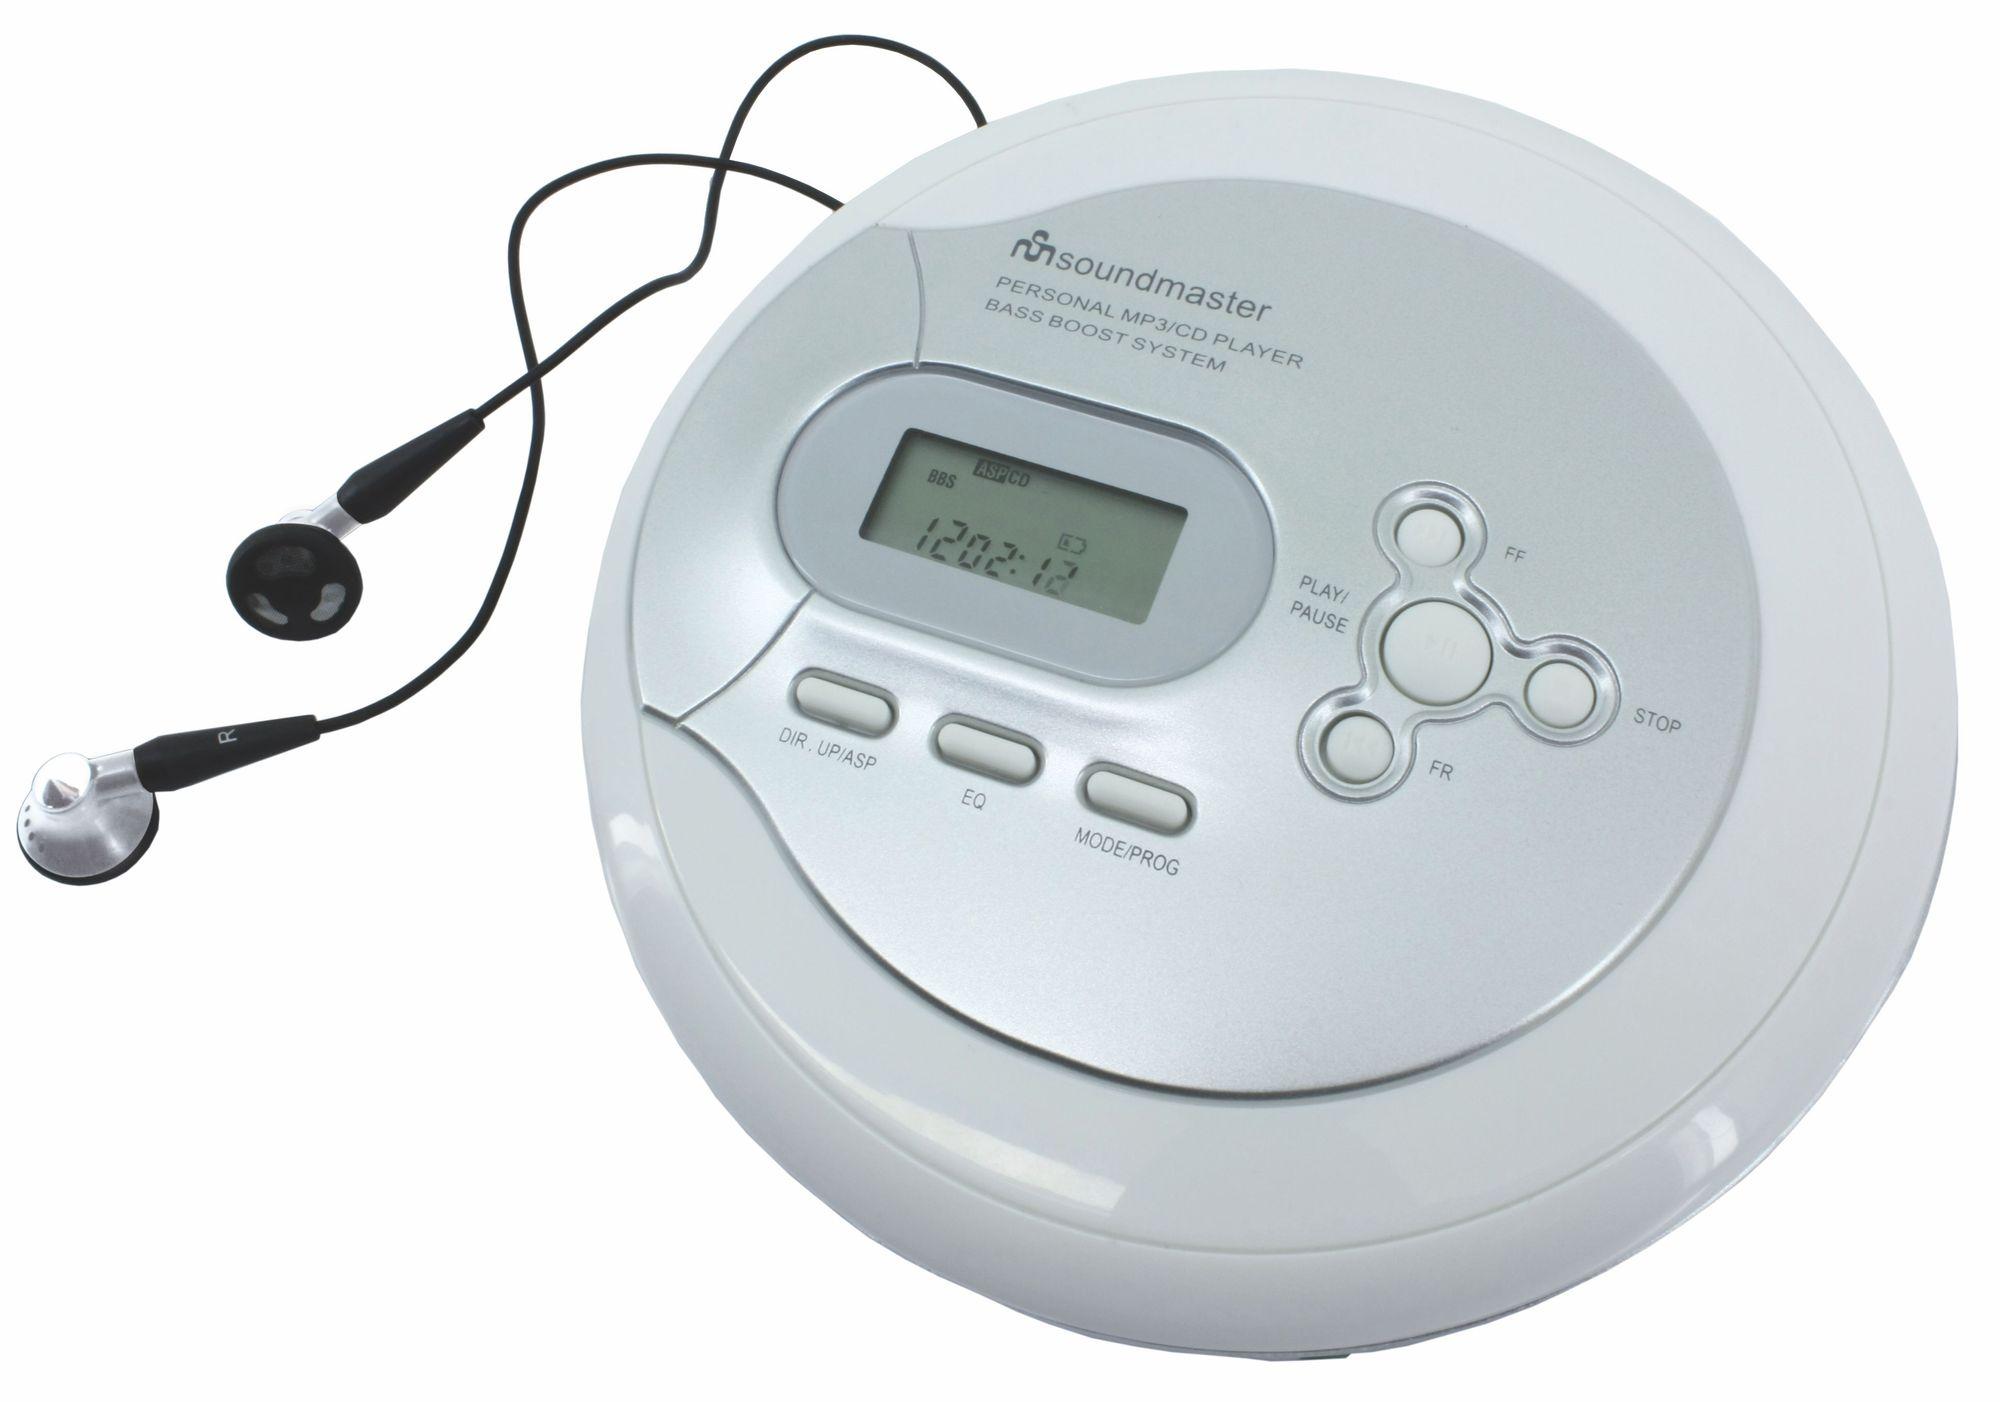 cd9180 cd mp3 player tragbar cd. Black Bedroom Furniture Sets. Home Design Ideas